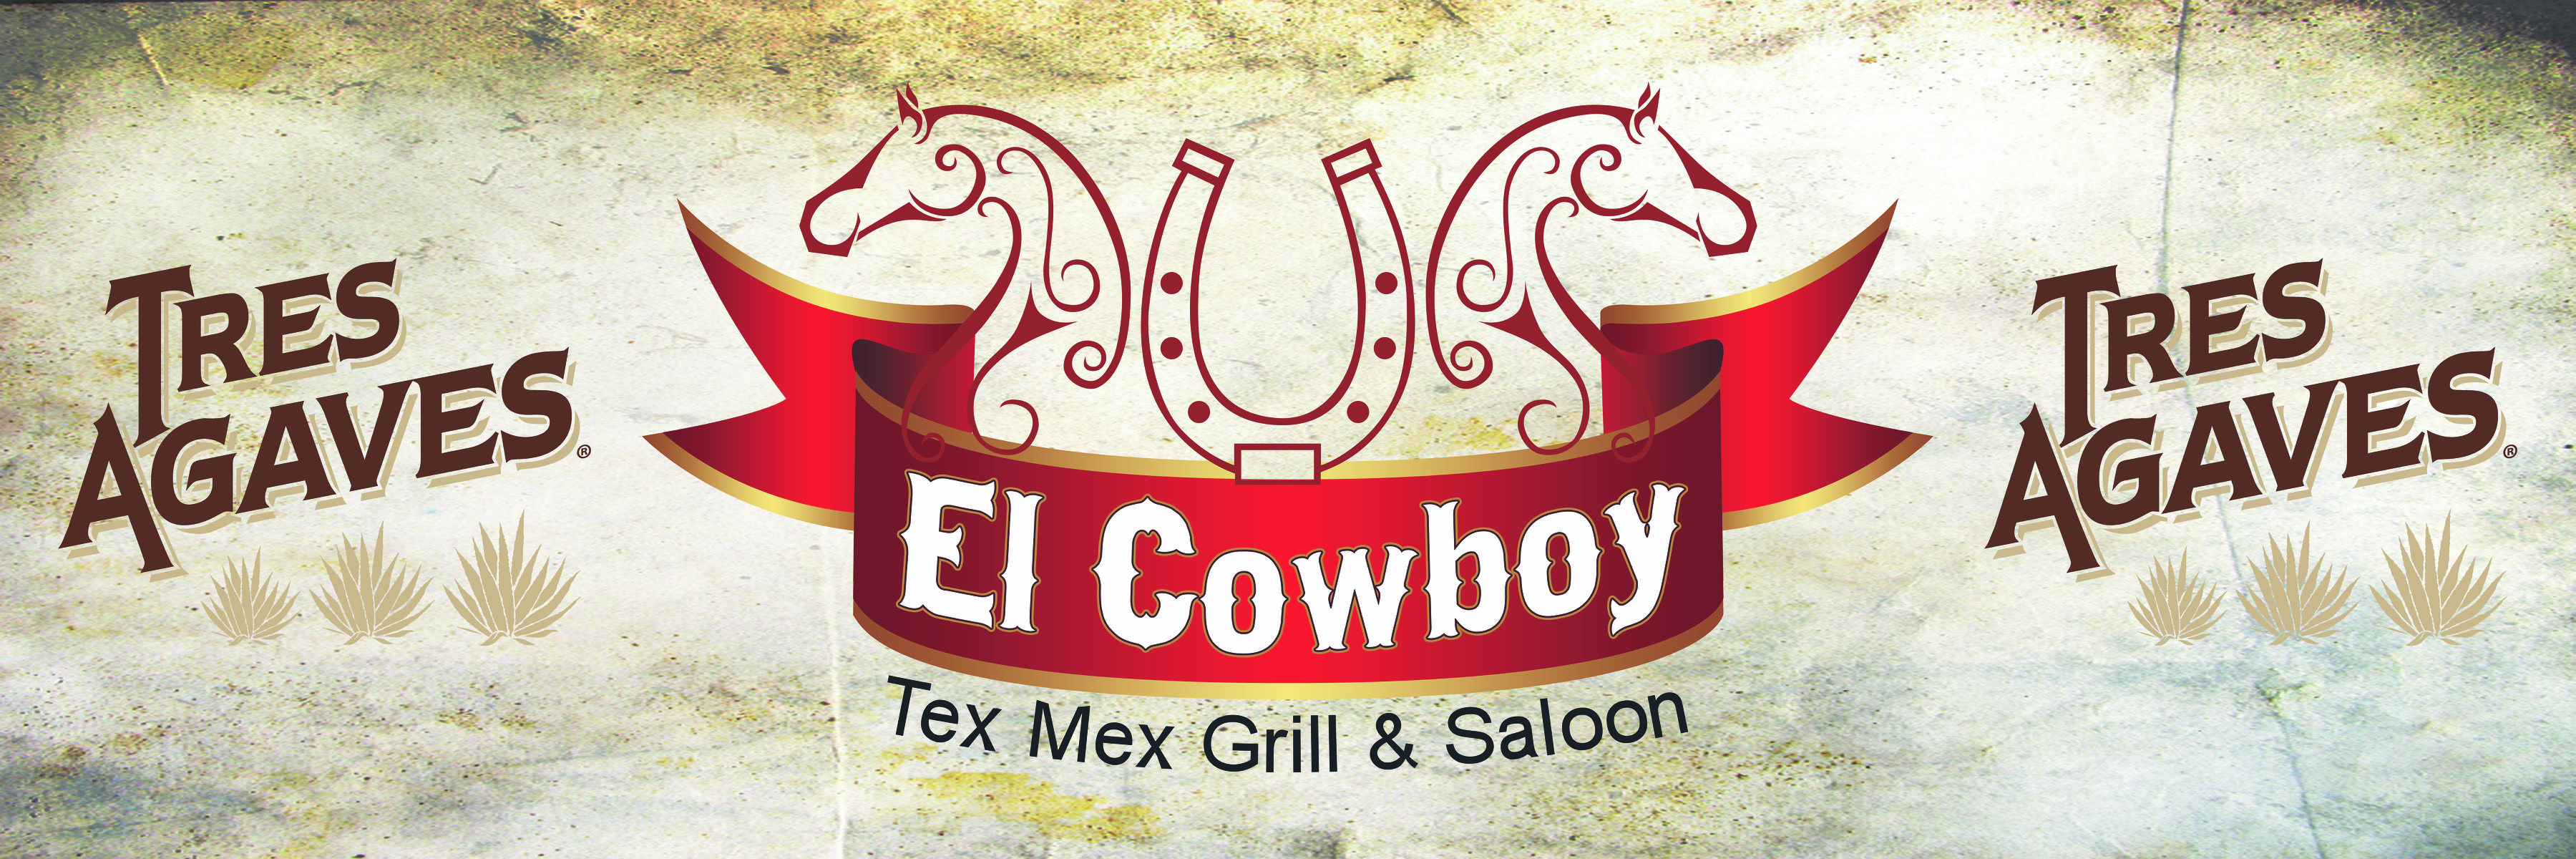 El Cowboy Tex Mex Grill & Saloon